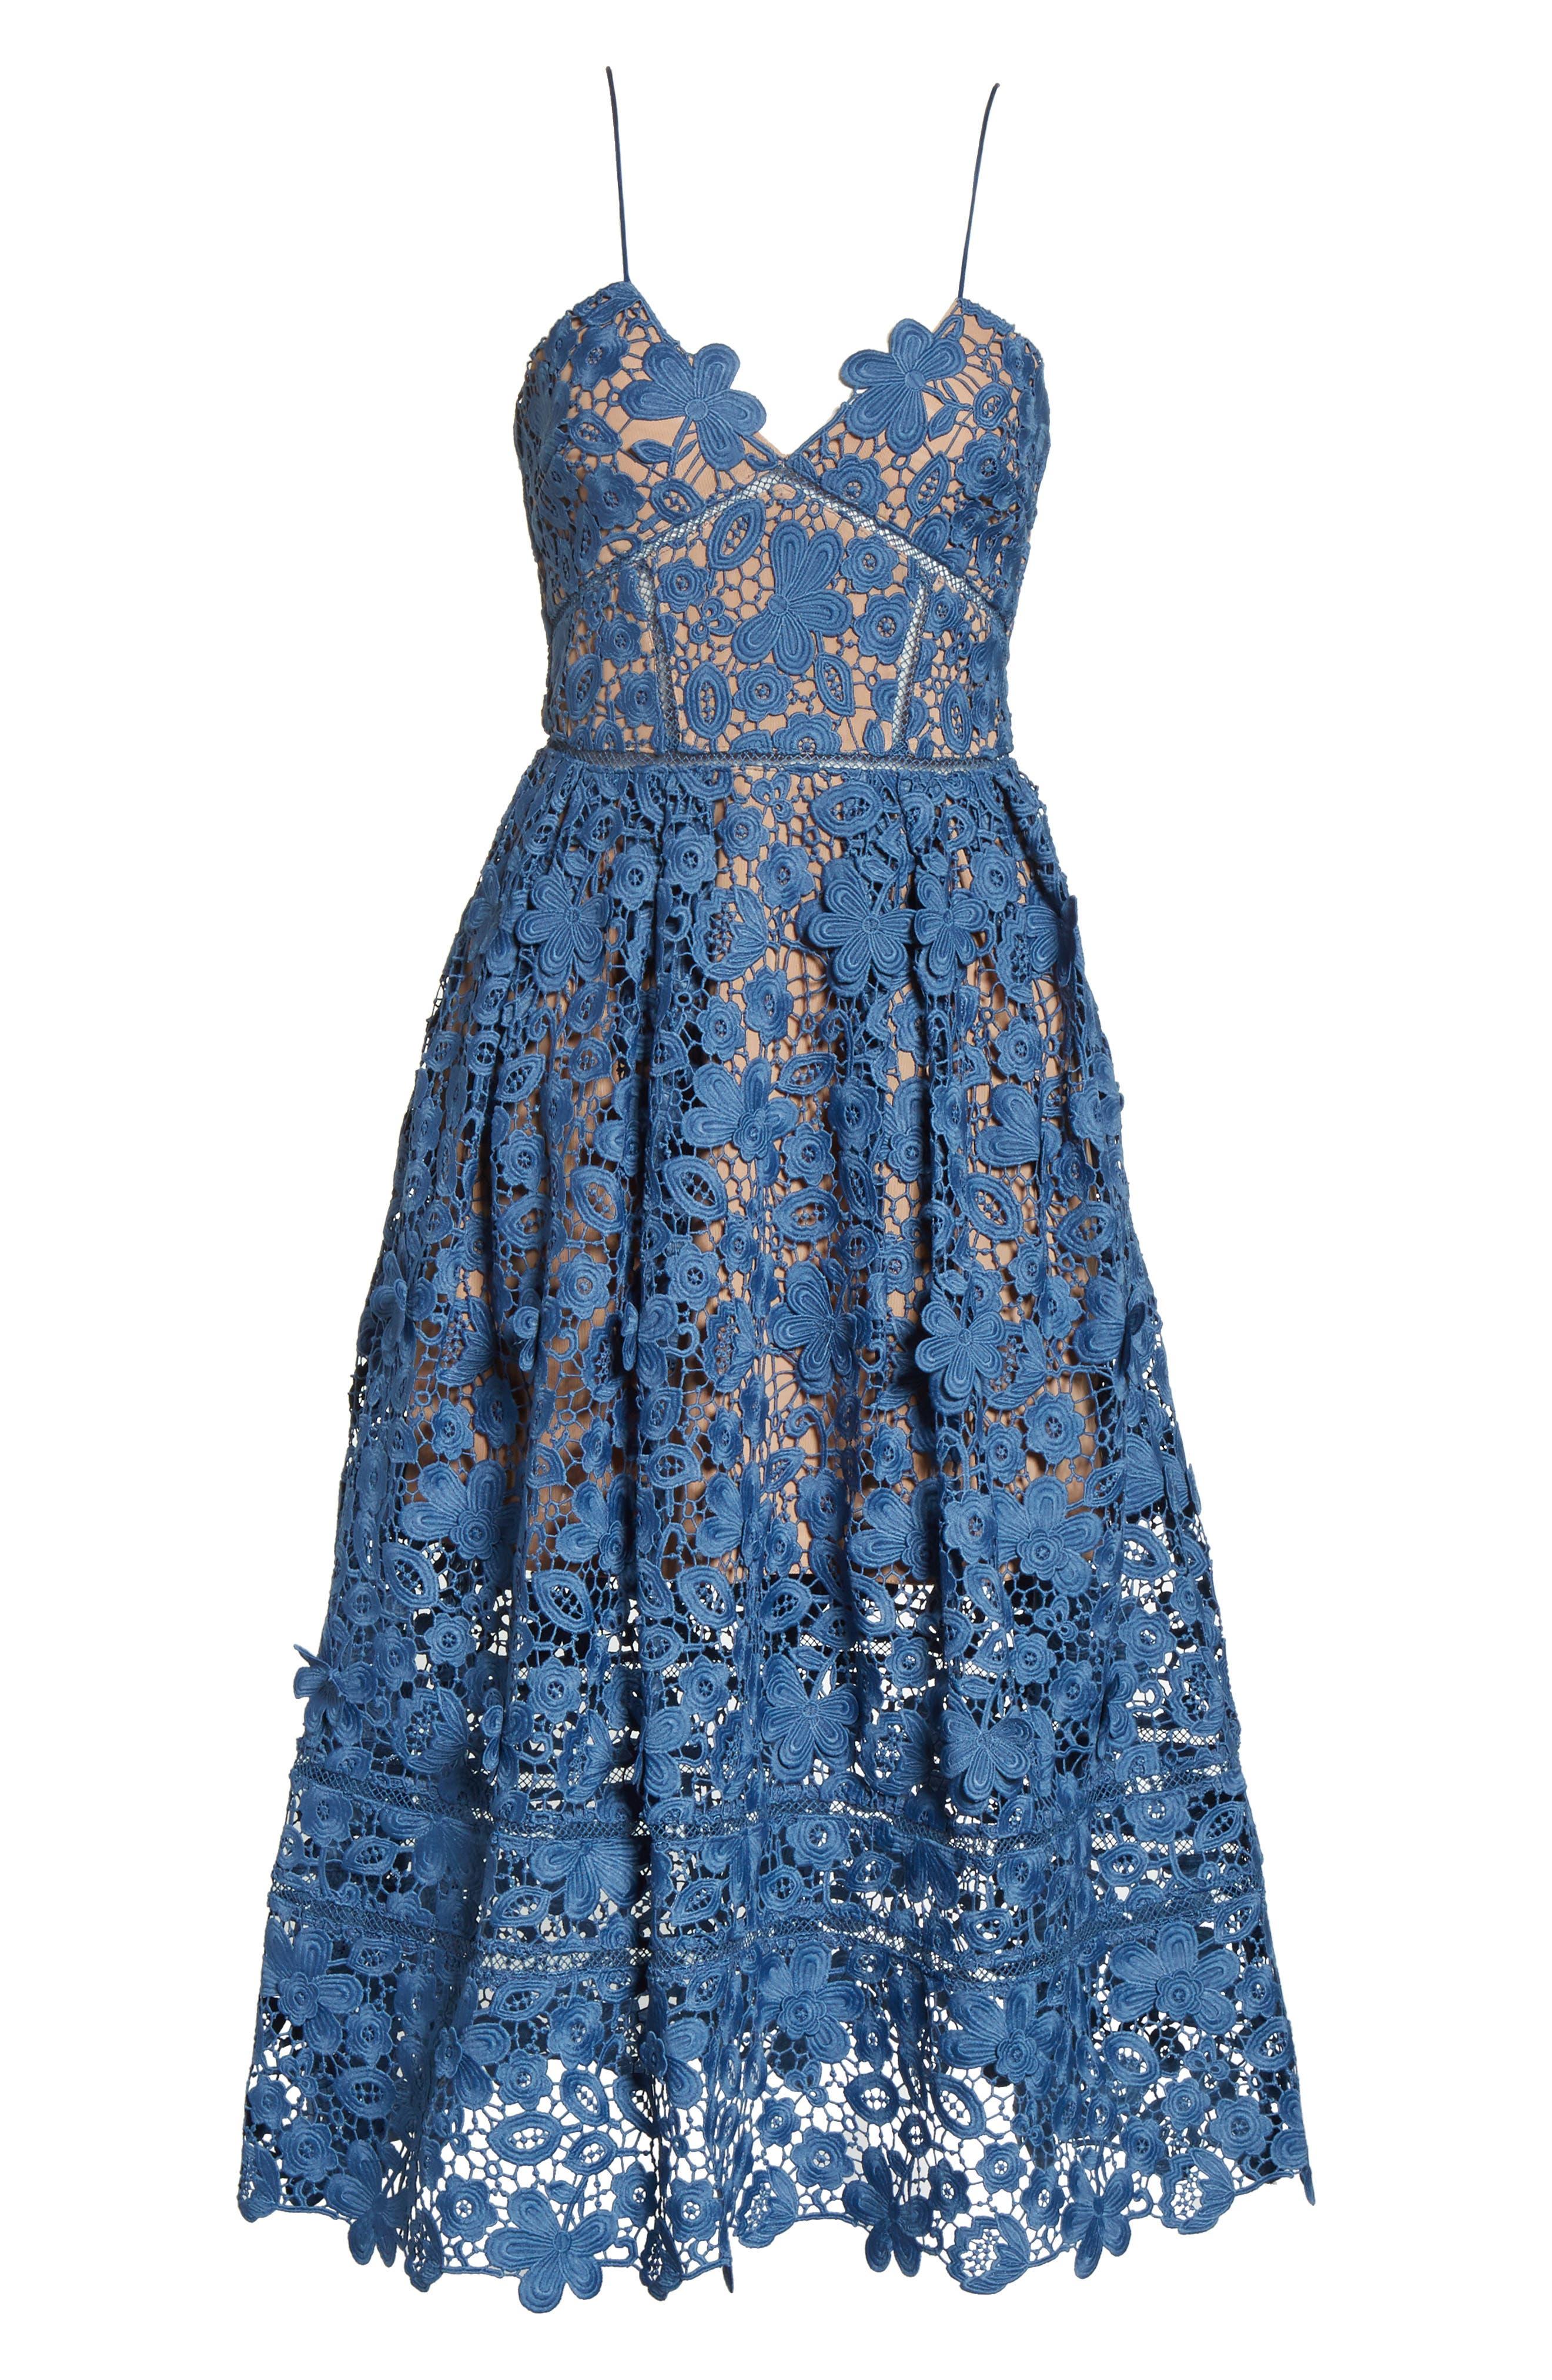 Azaelea 3D Lace Fit & Flare Dress,                             Alternate thumbnail 6, color,                             SLATE BLUE